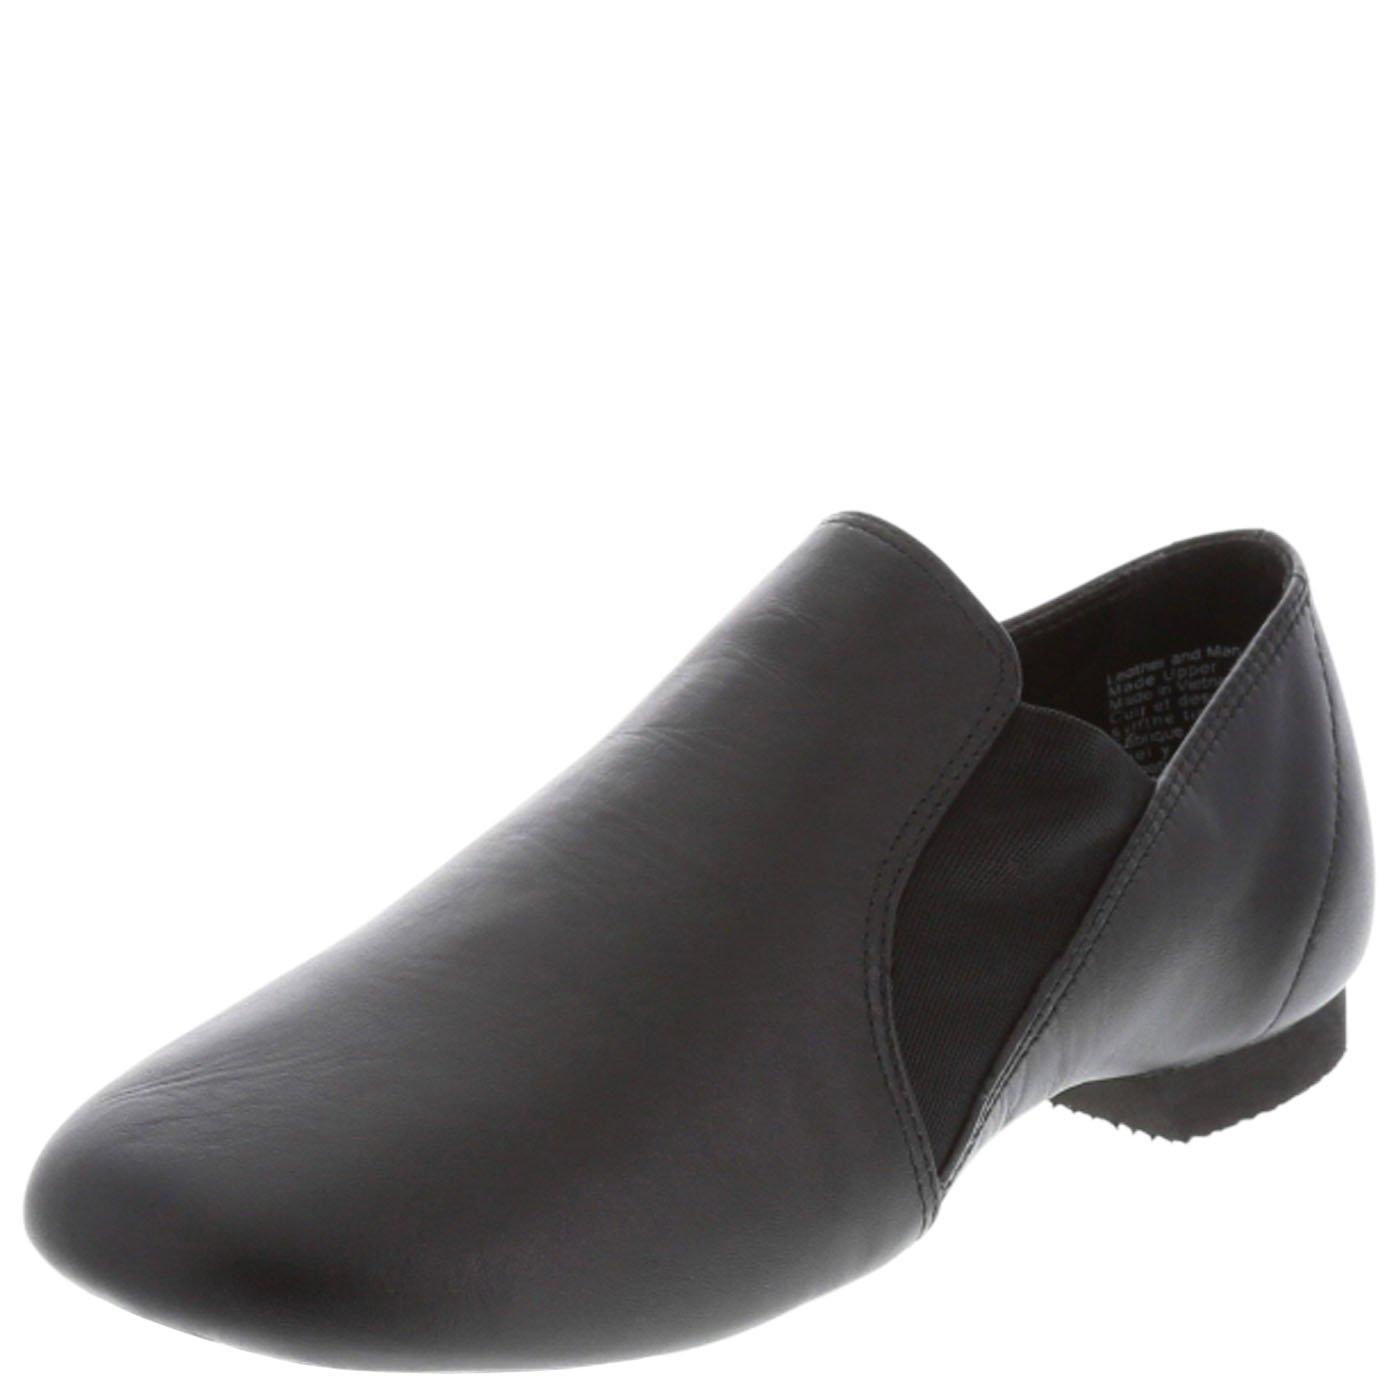 American Ballet Theatre For Spotlights Girl's Twin Gore Jazz Shoe Black 8